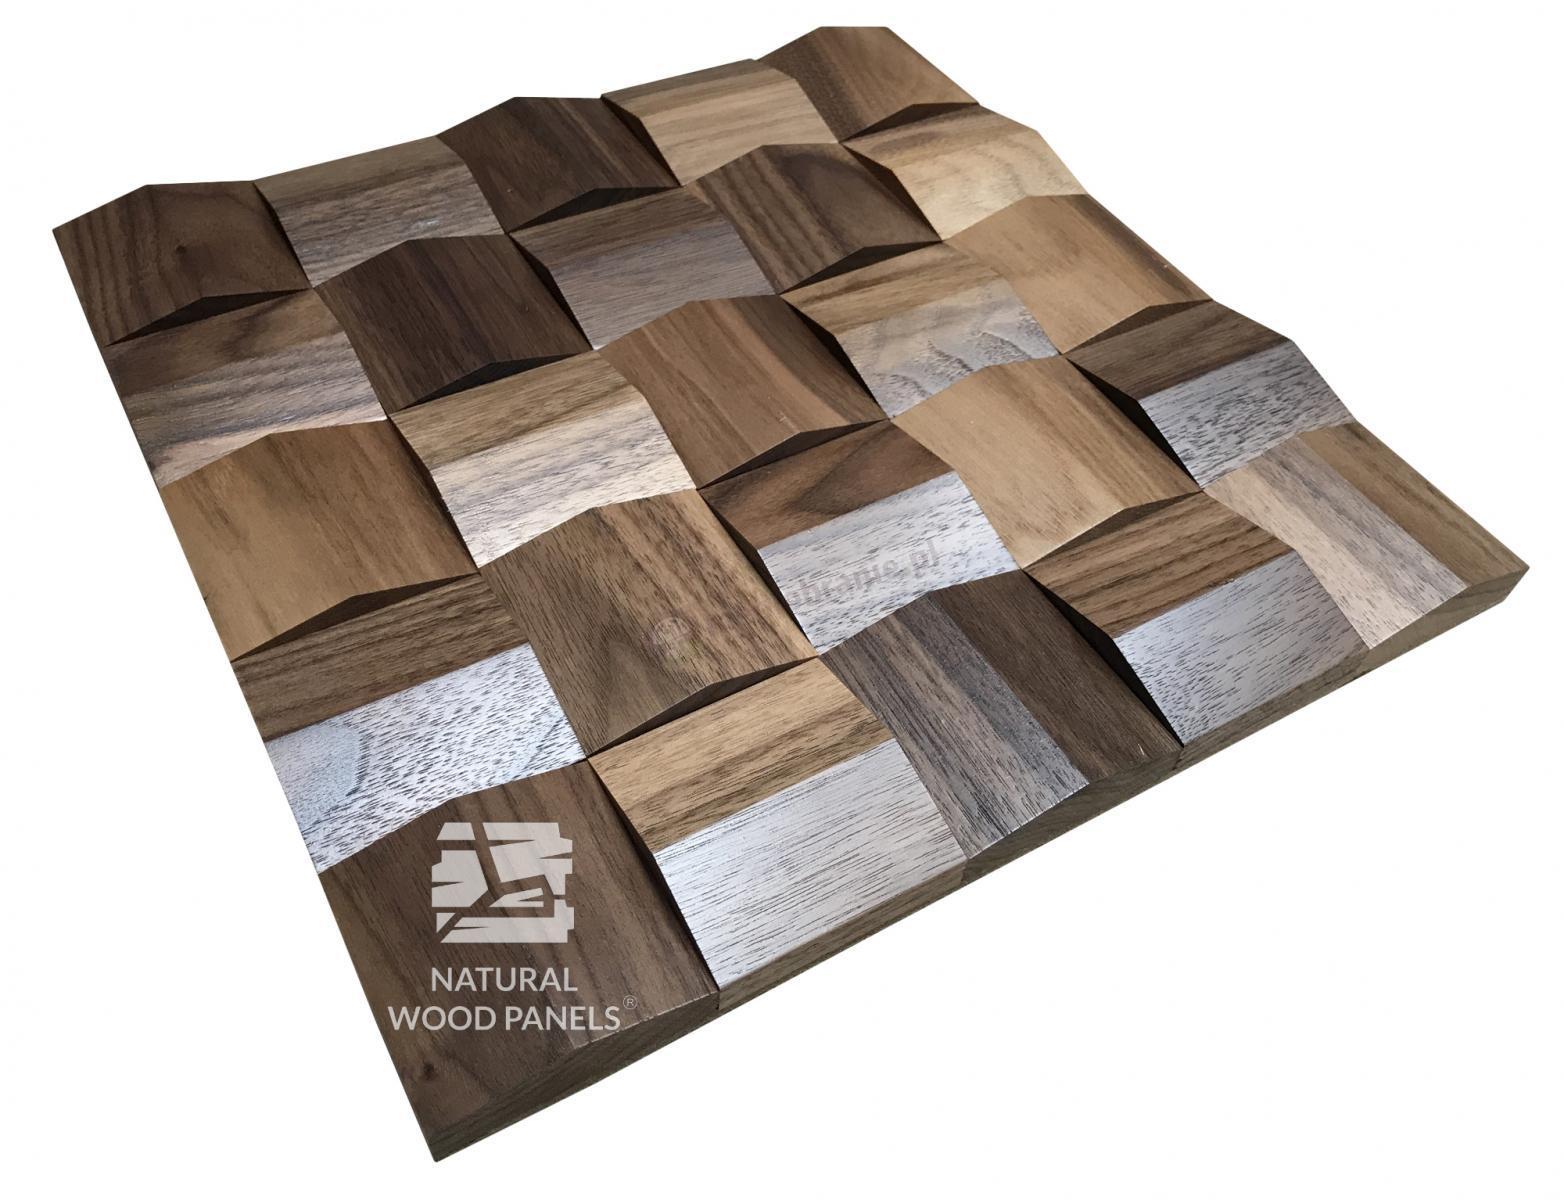 Panele Crystal  series – Orzech Amerykański *083 - Natural Wood Panels